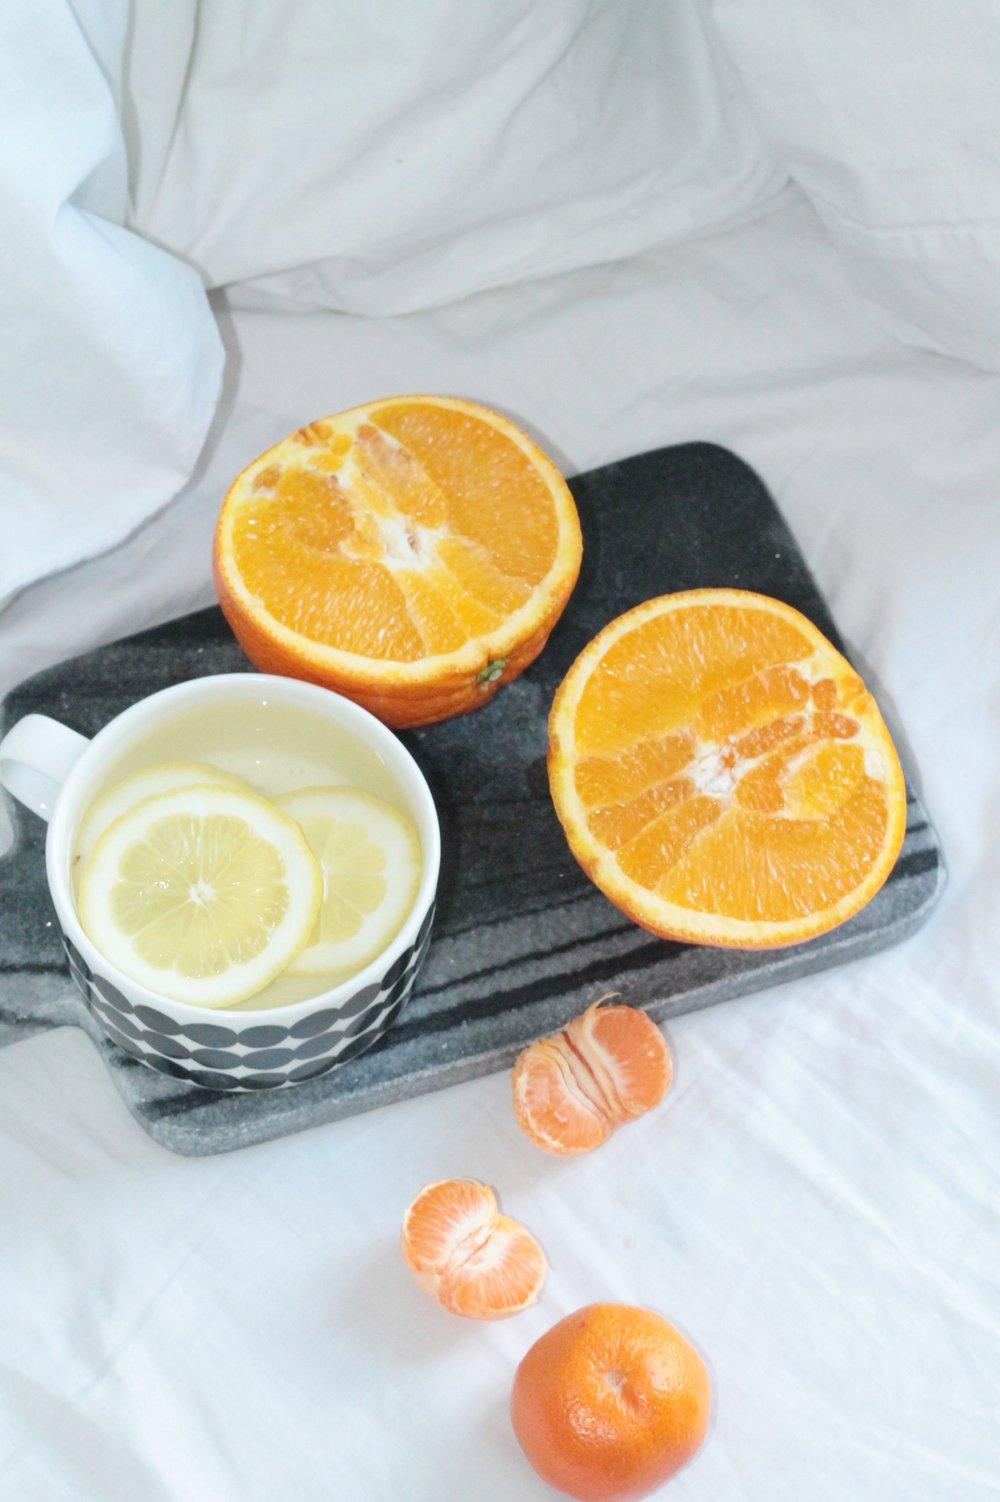 Oranges and Lemon water